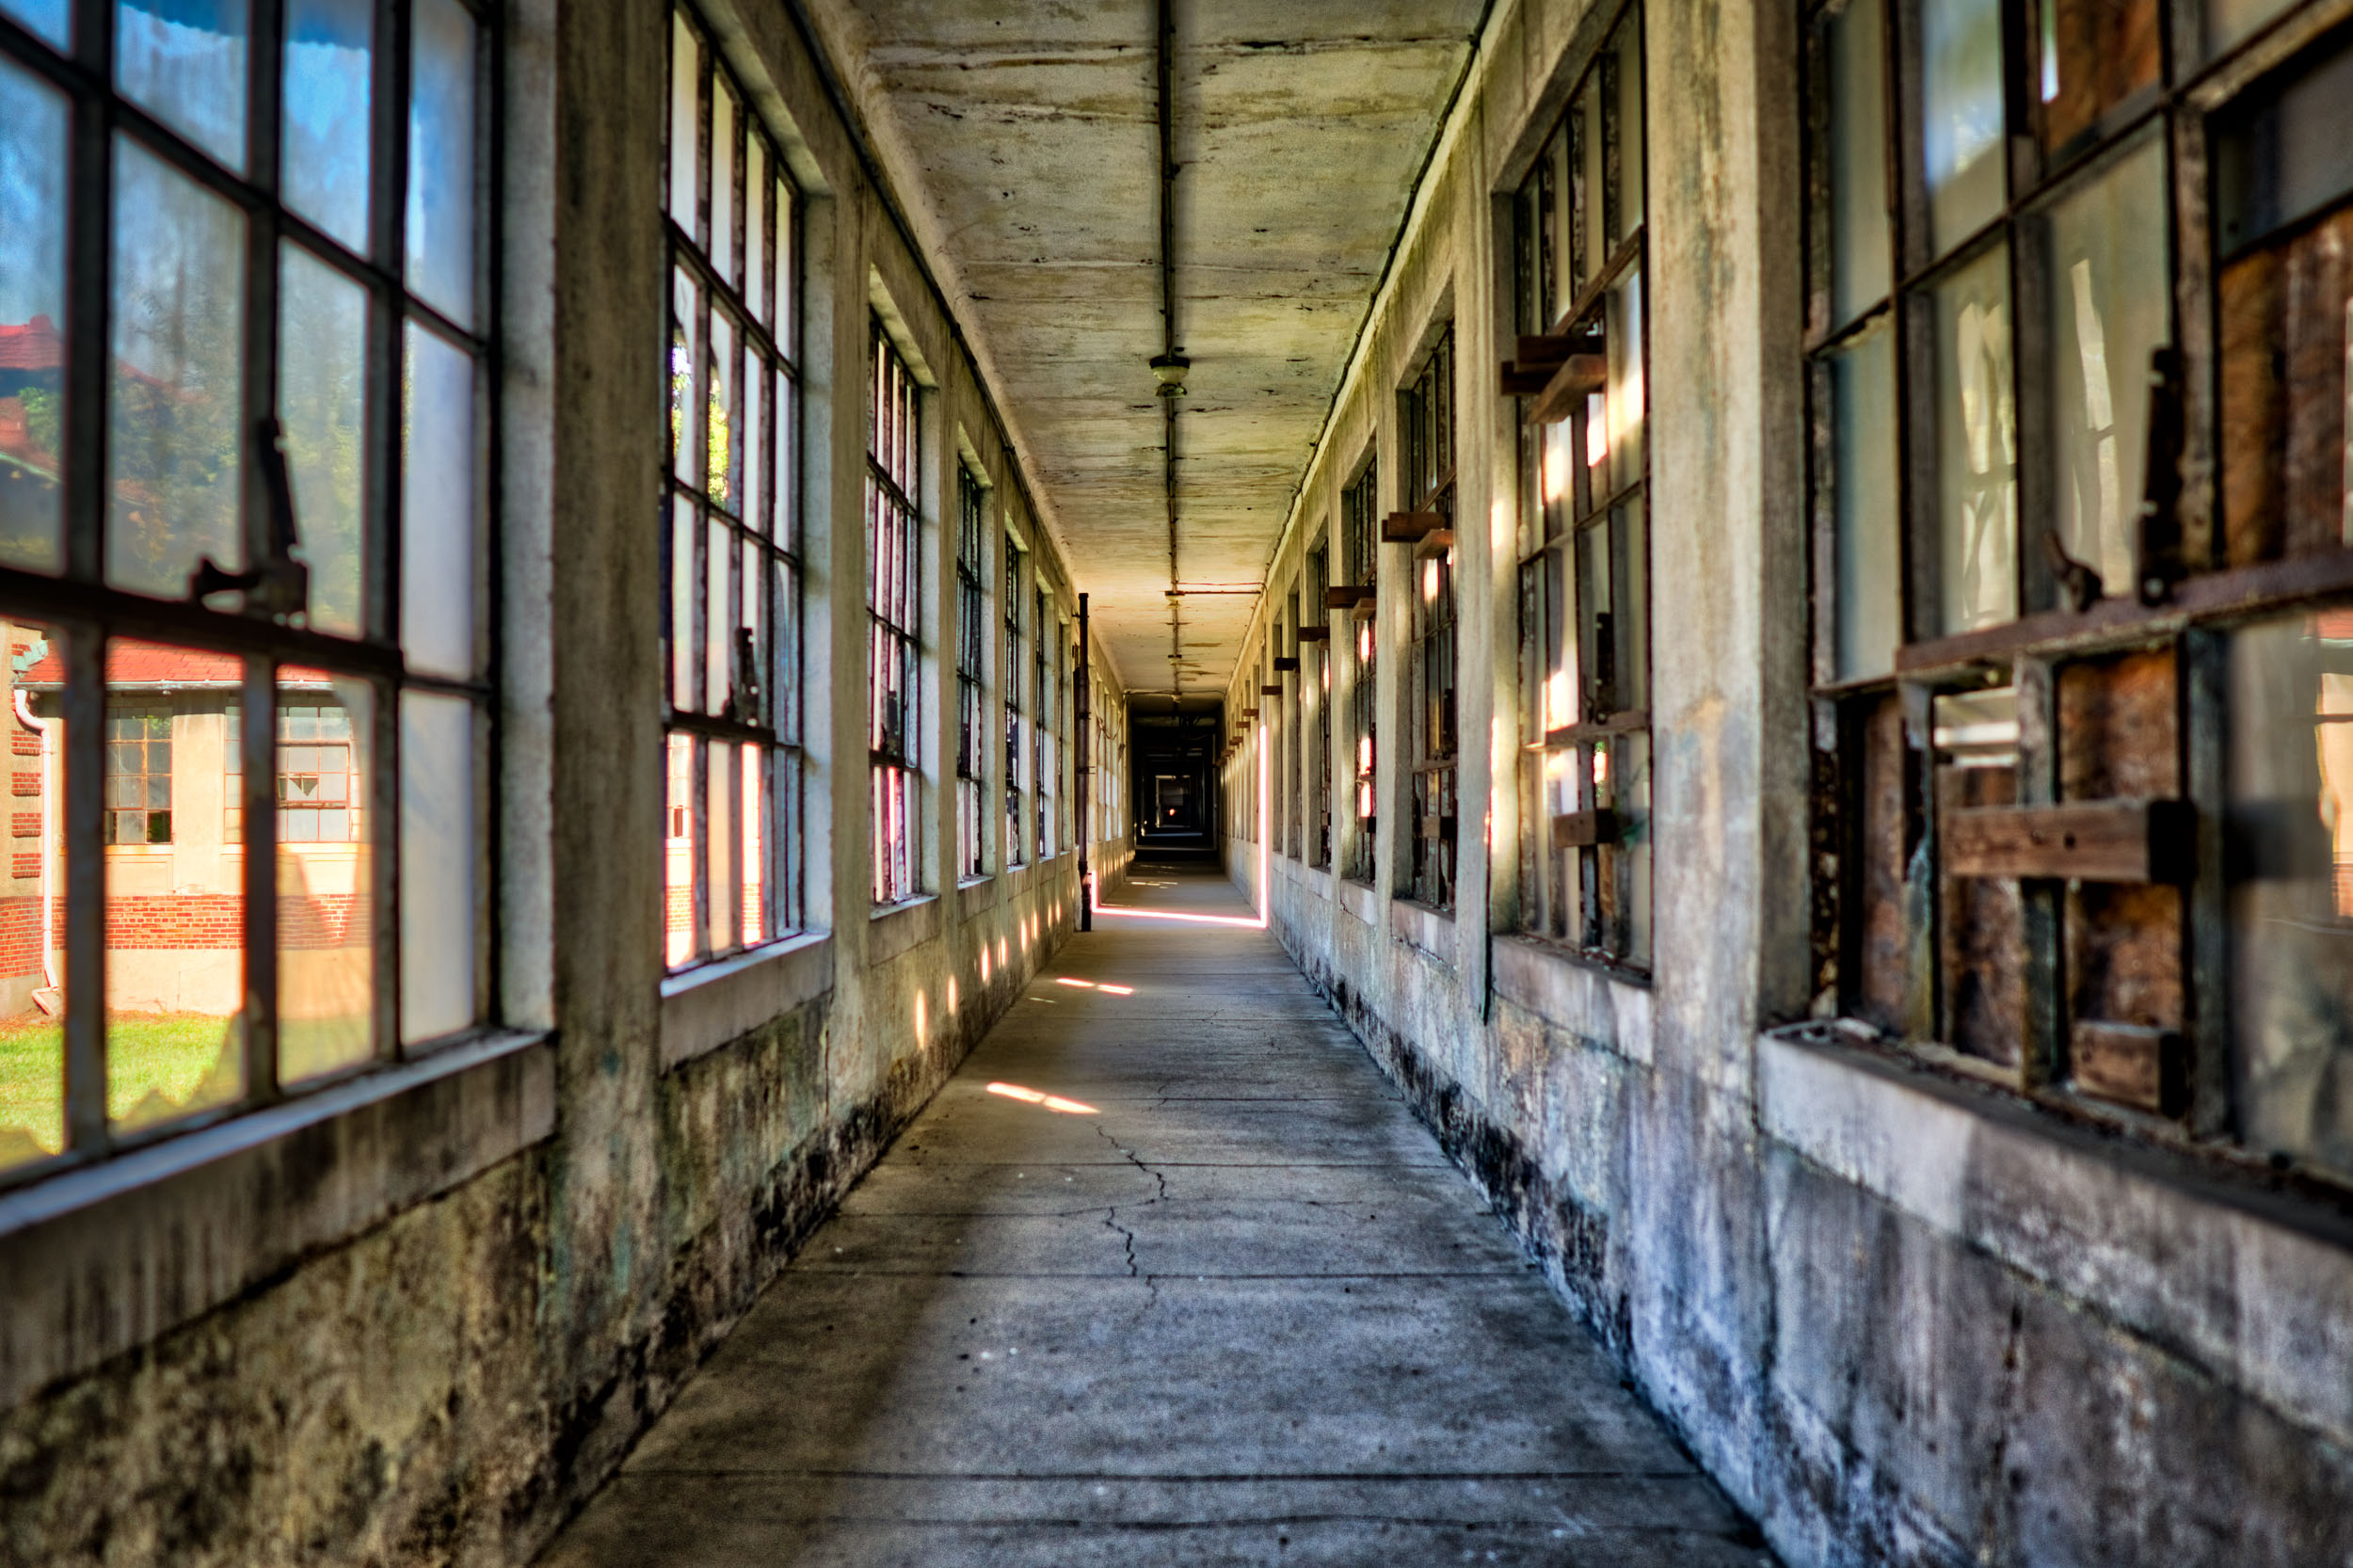 Receding Hallway